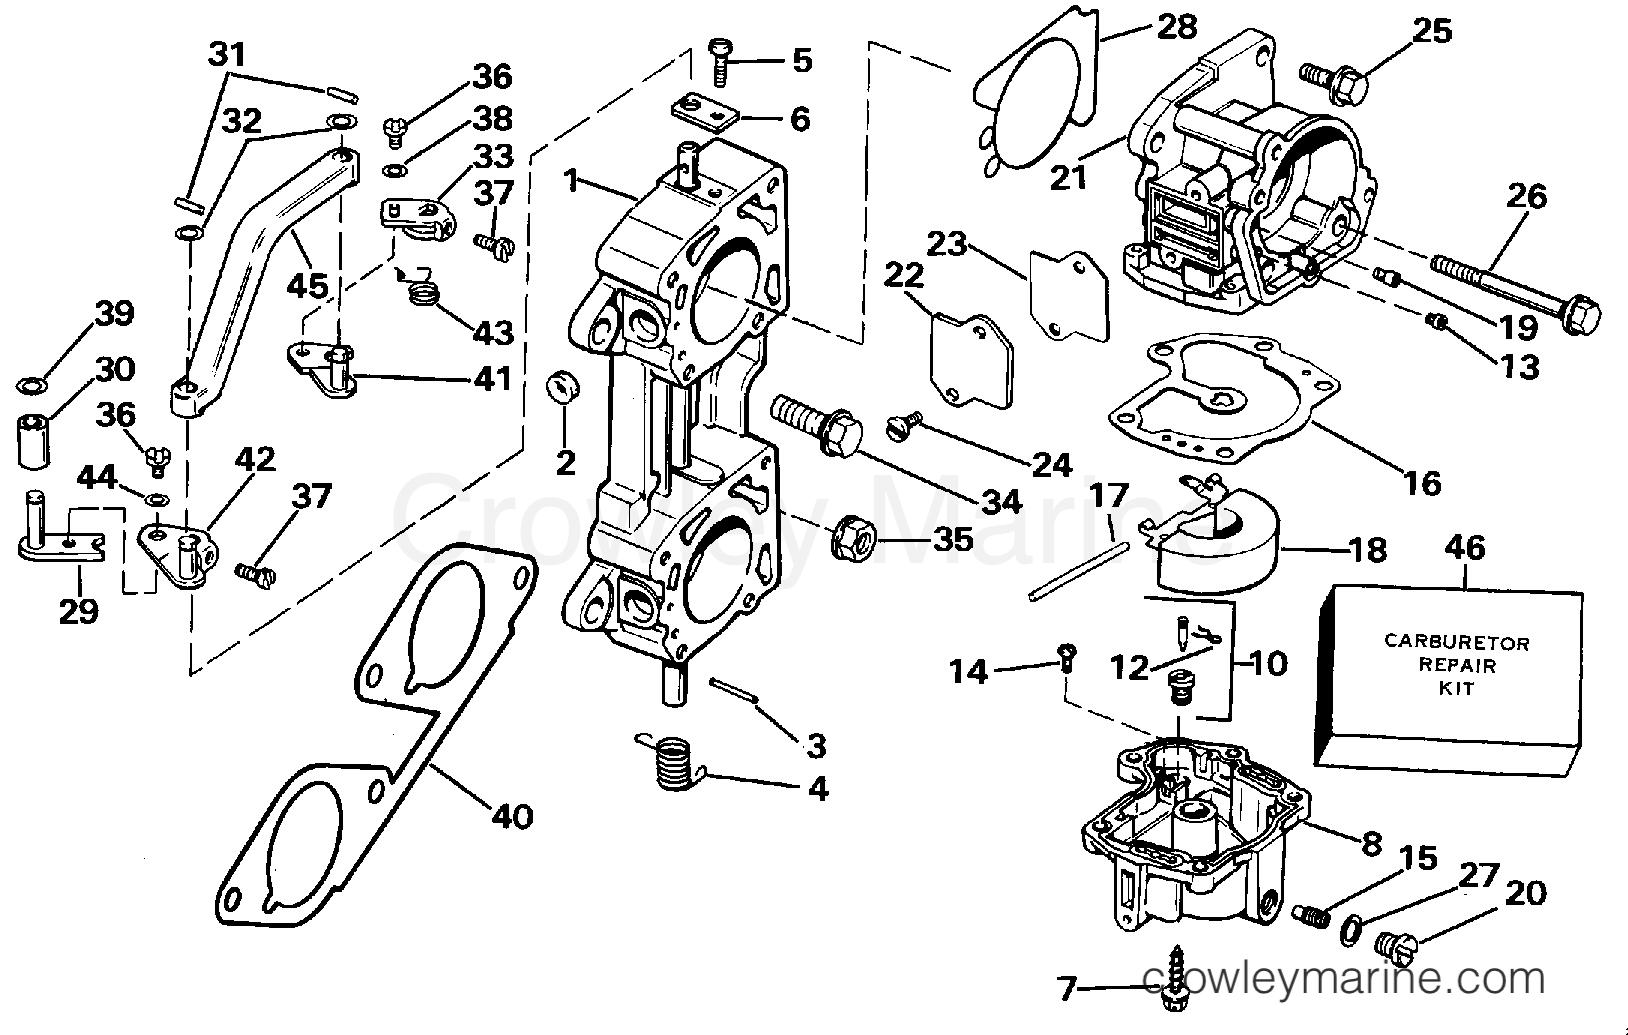 Carburetor And Linkage